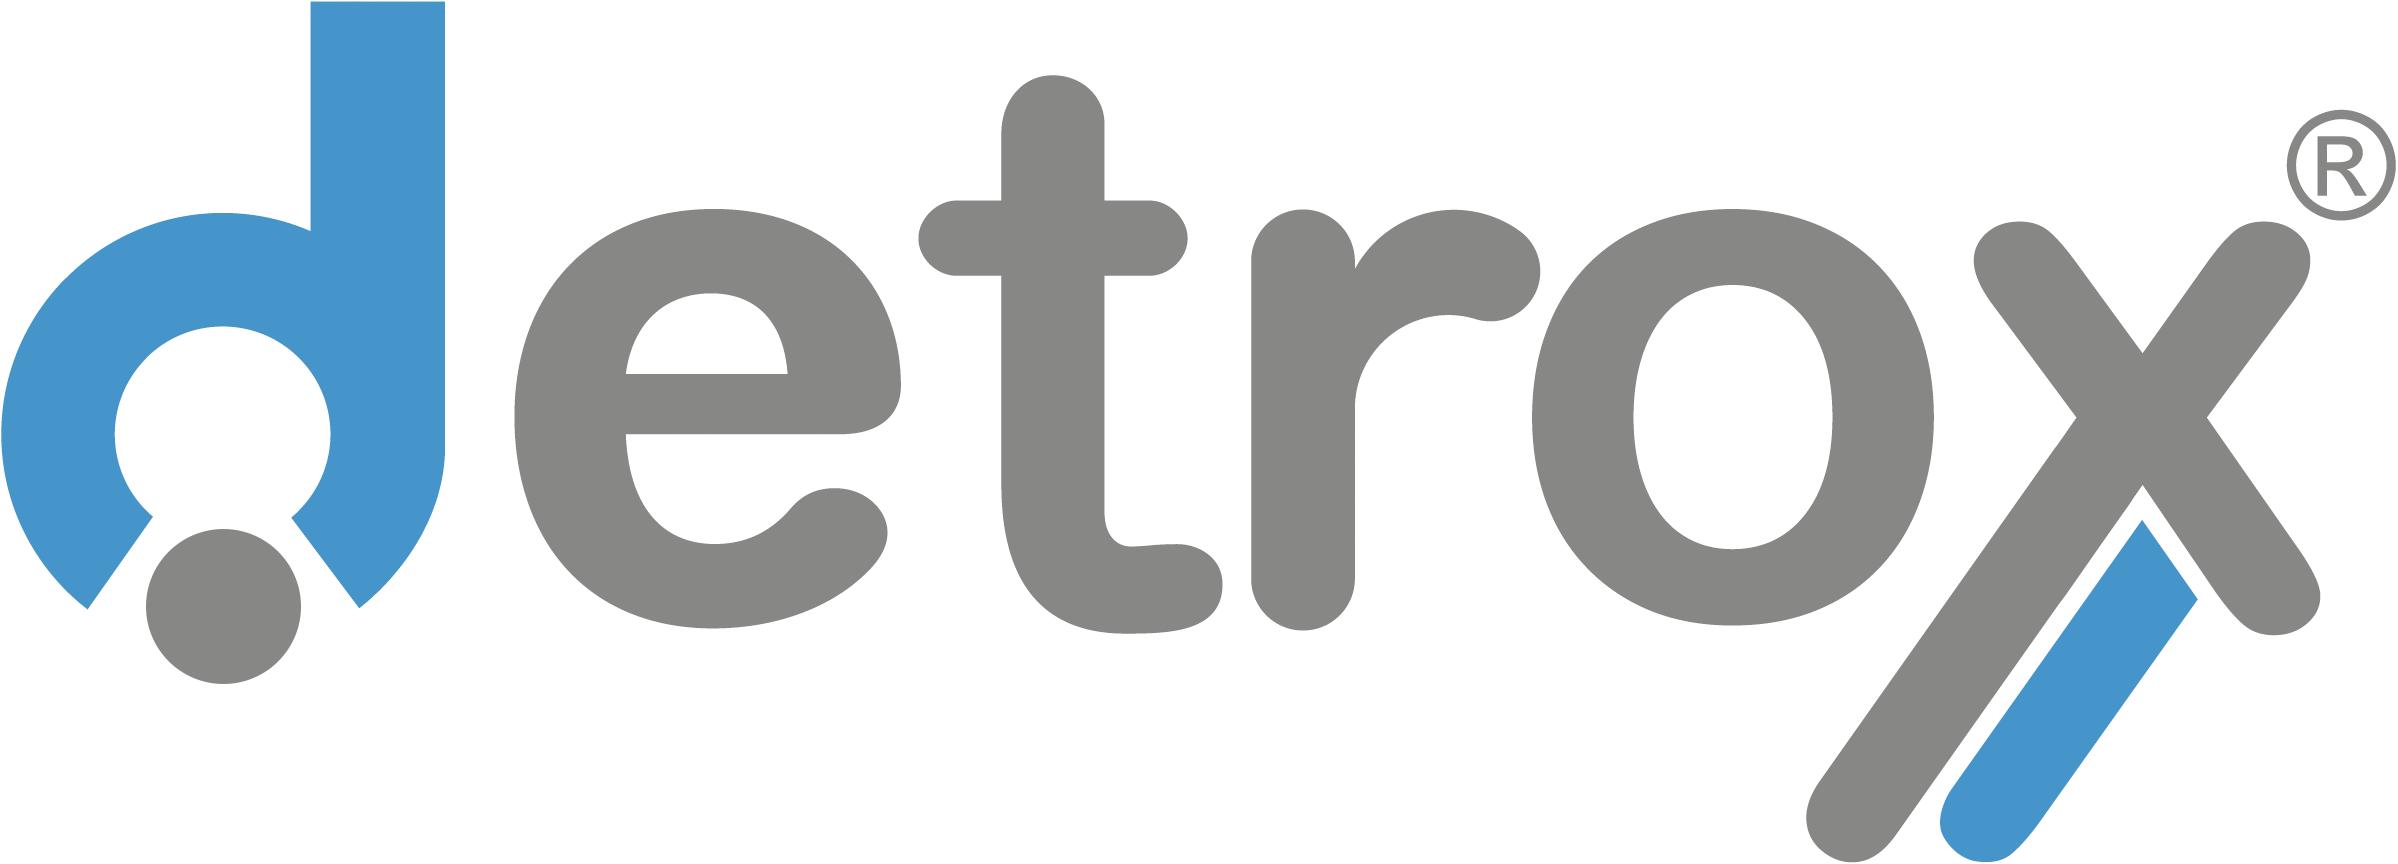 Detrox